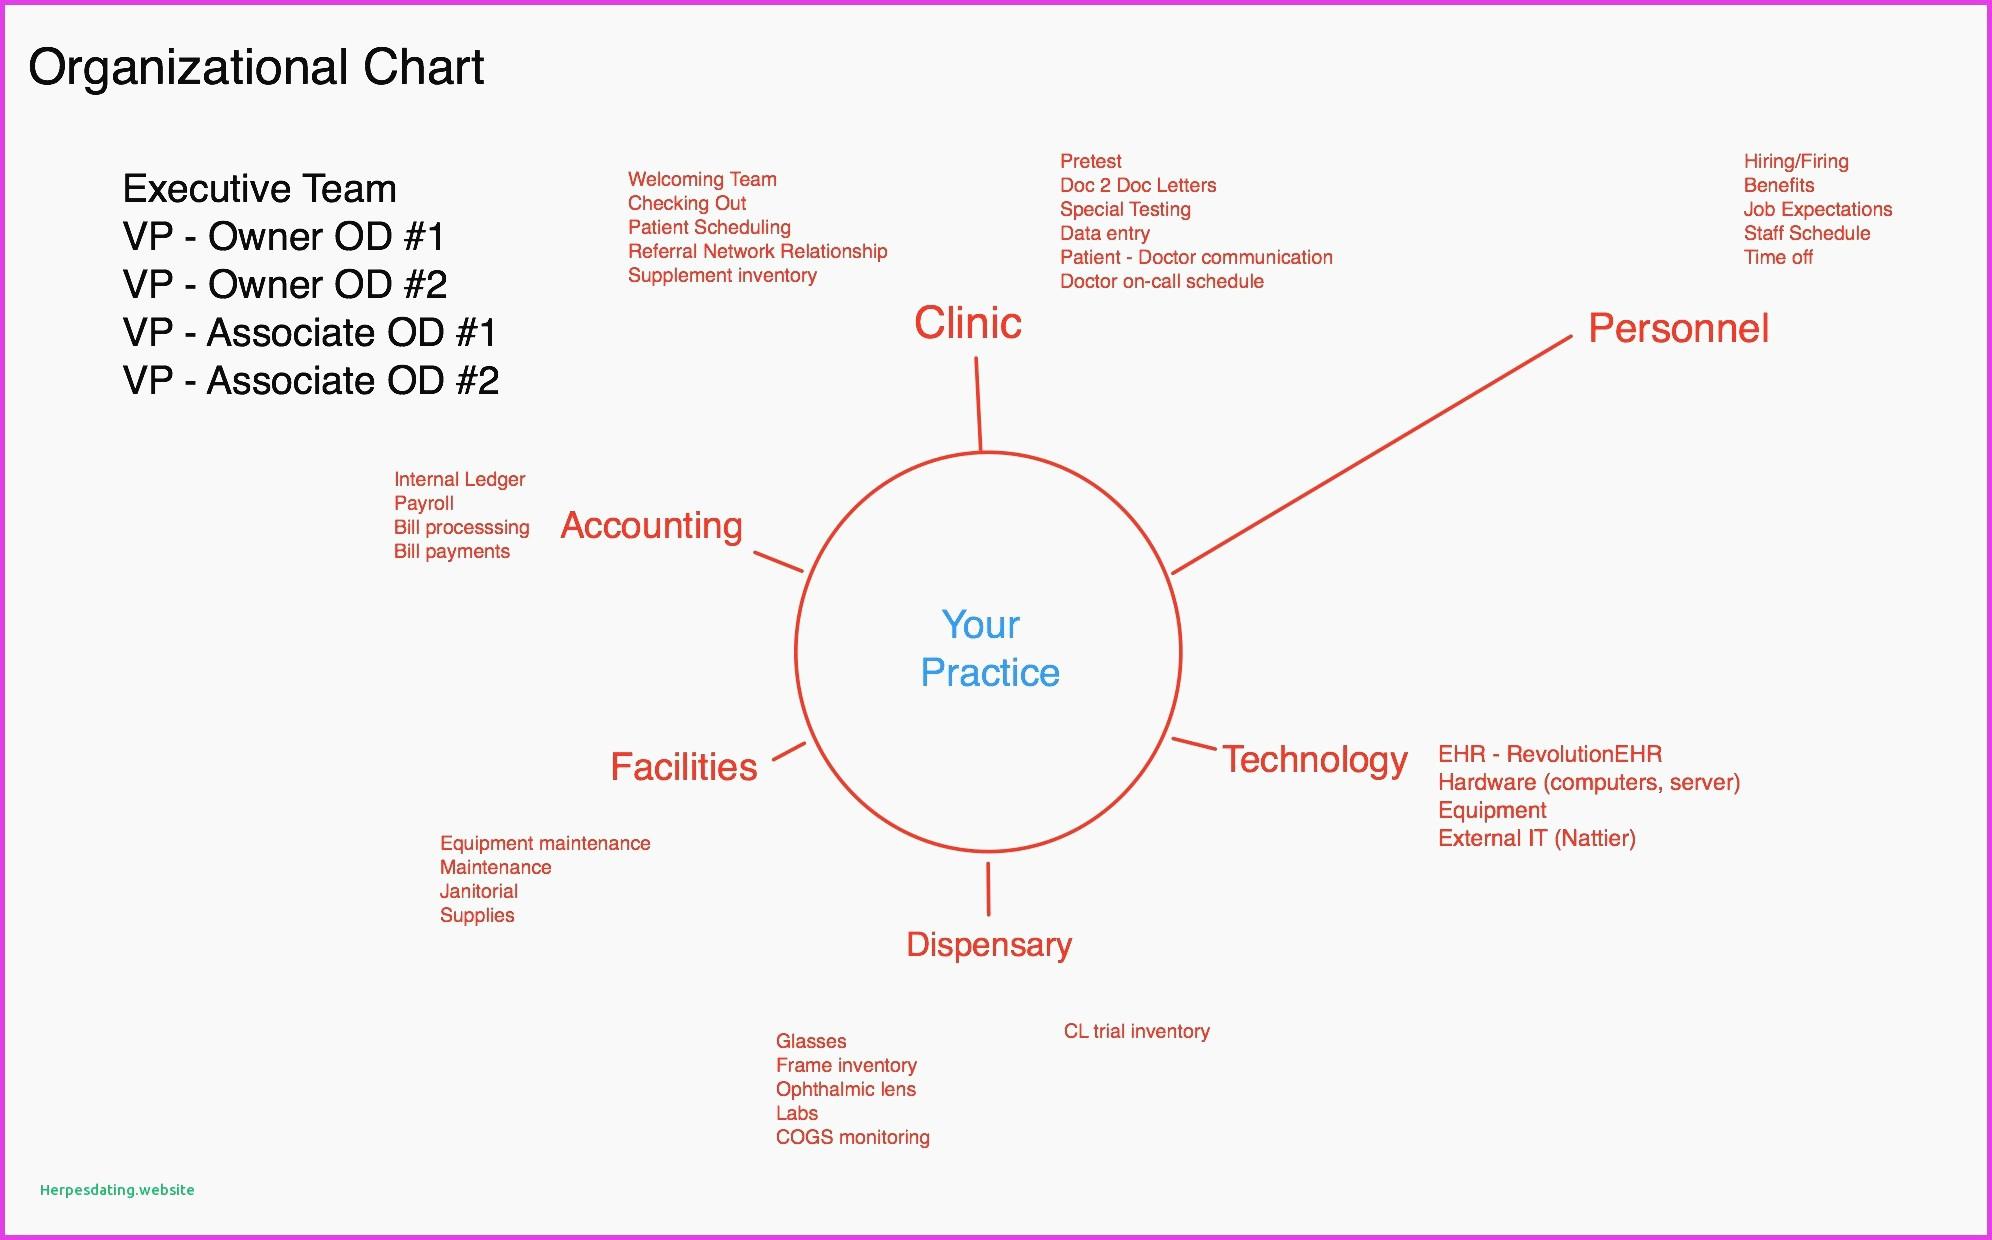 Pedigree Chart Template. Commons Dog Pedigree Chart Template - Free Printable Dog Pedigree Generator